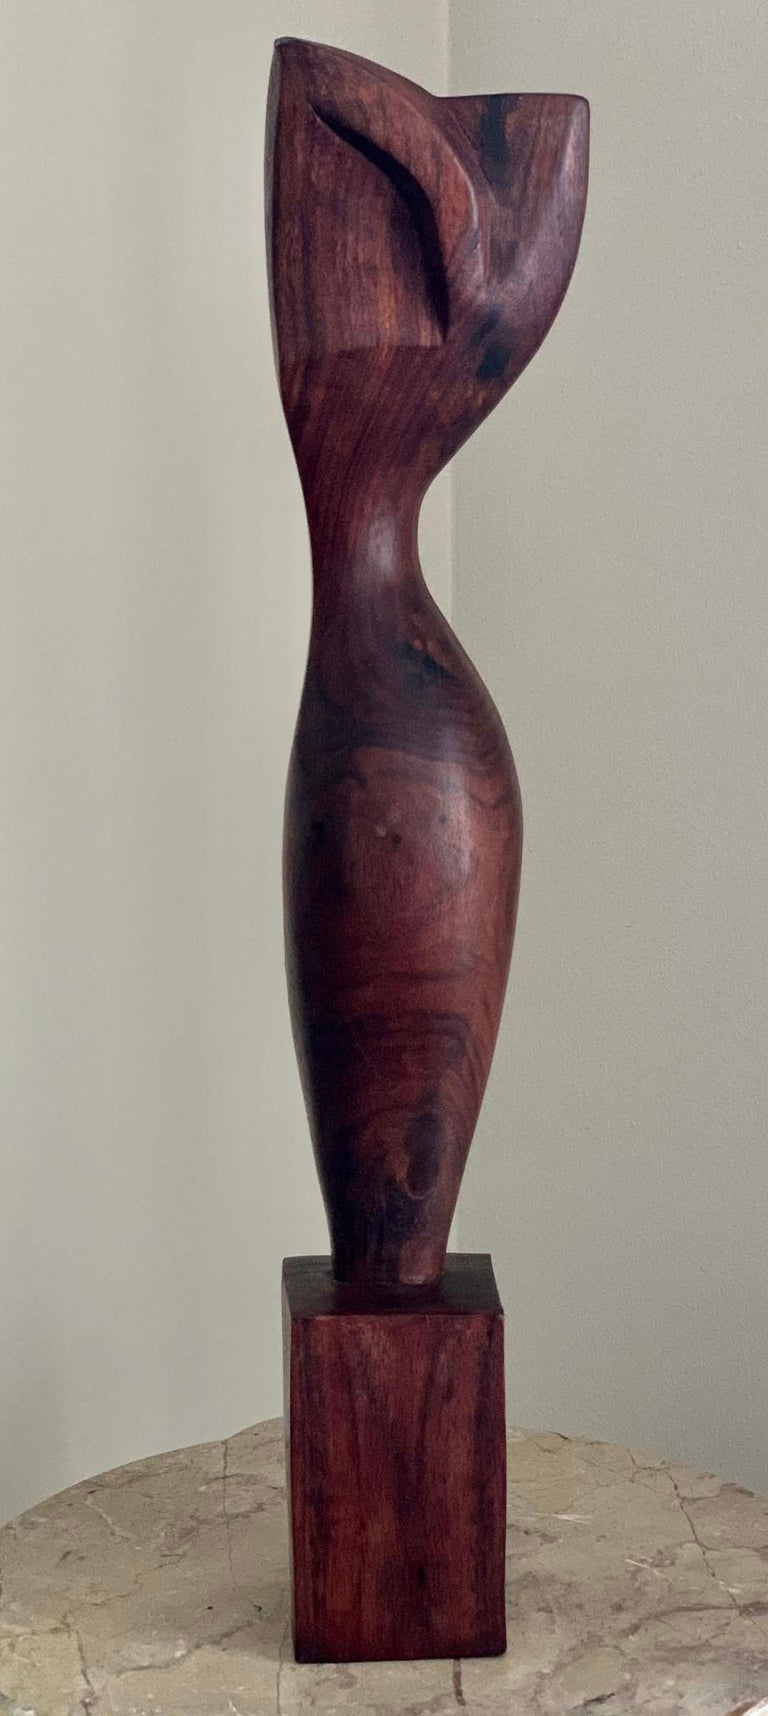 STANDING NUDE - Sculpture by Ulises Jimenez Obregon